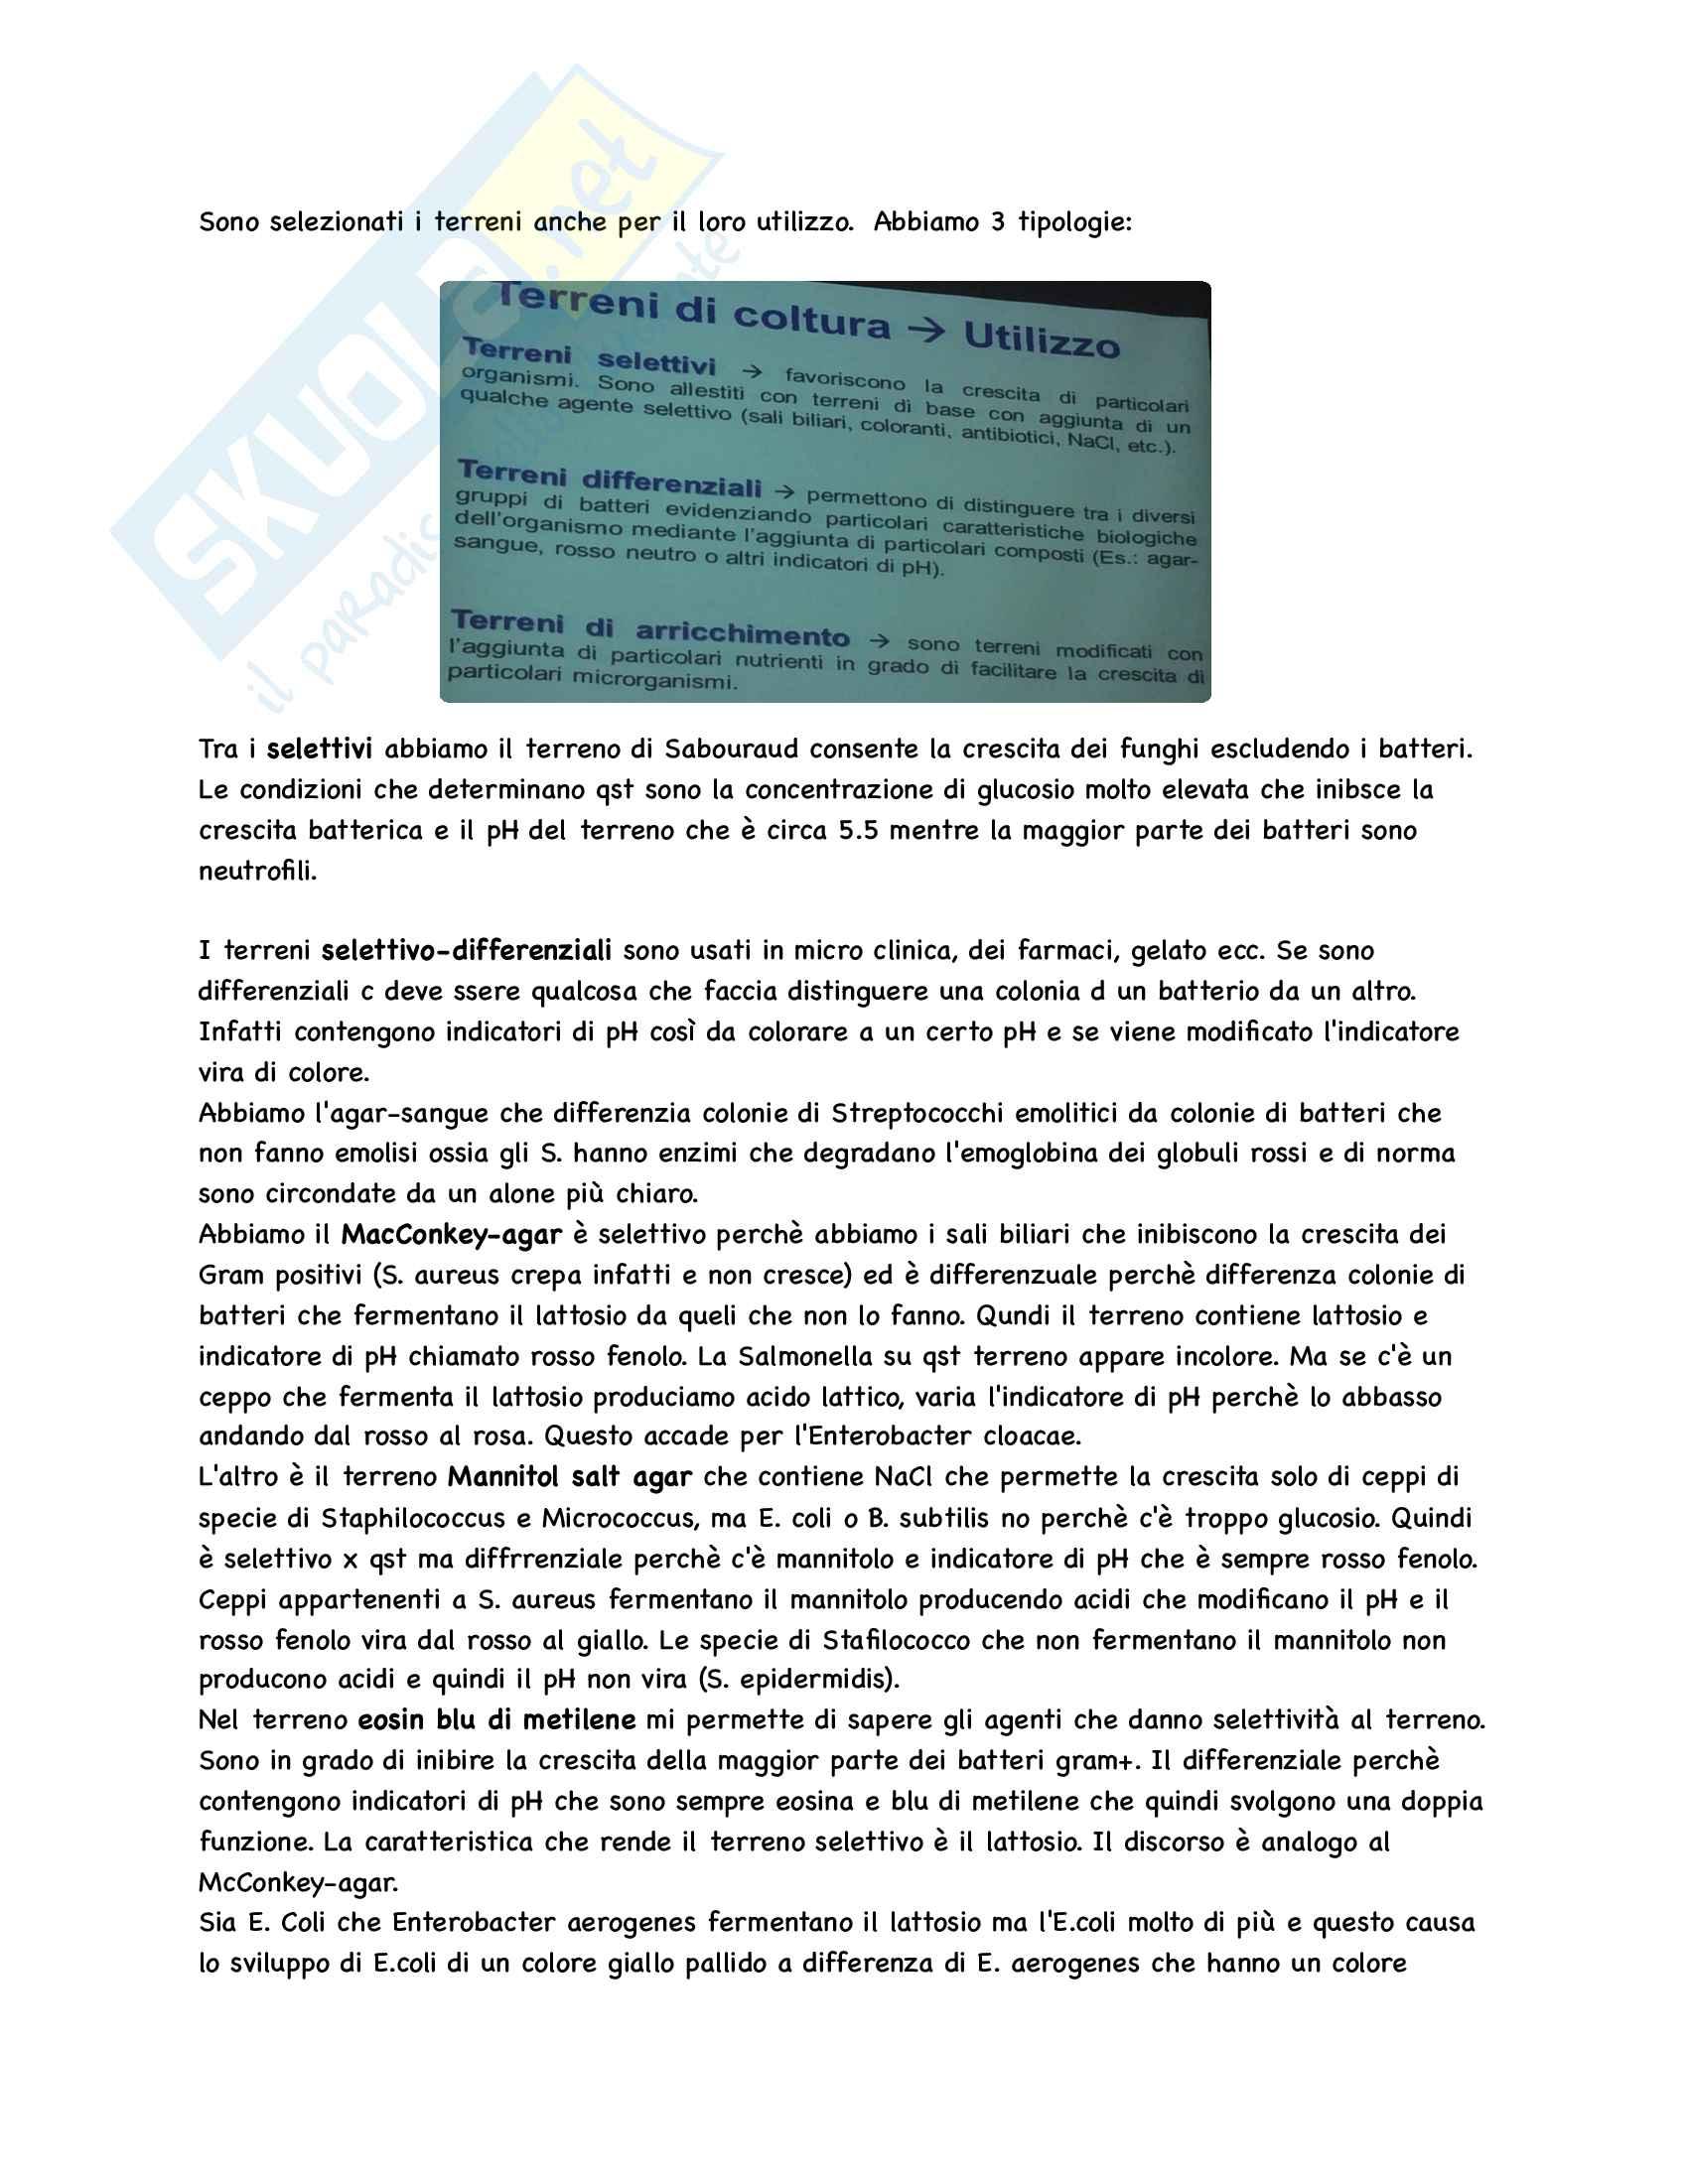 Microbiologia Appunti Parte 1 Pag. 31